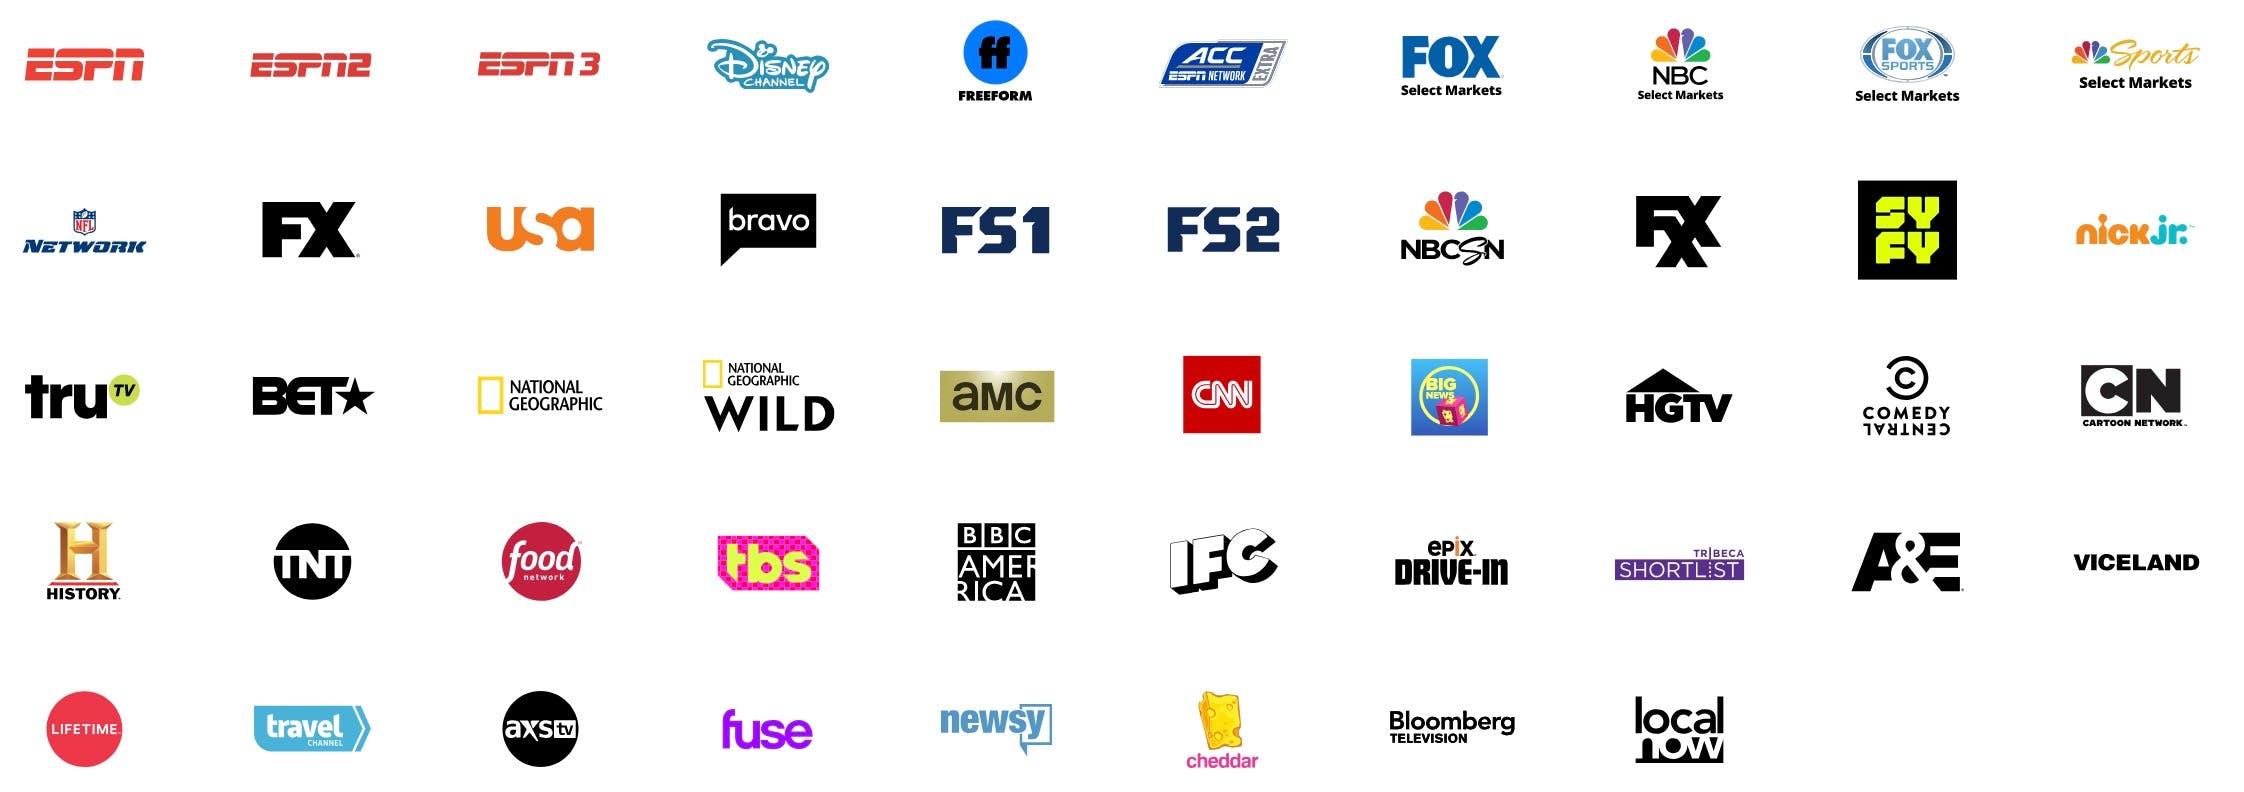 Bears Lions sling tv streaming nfl